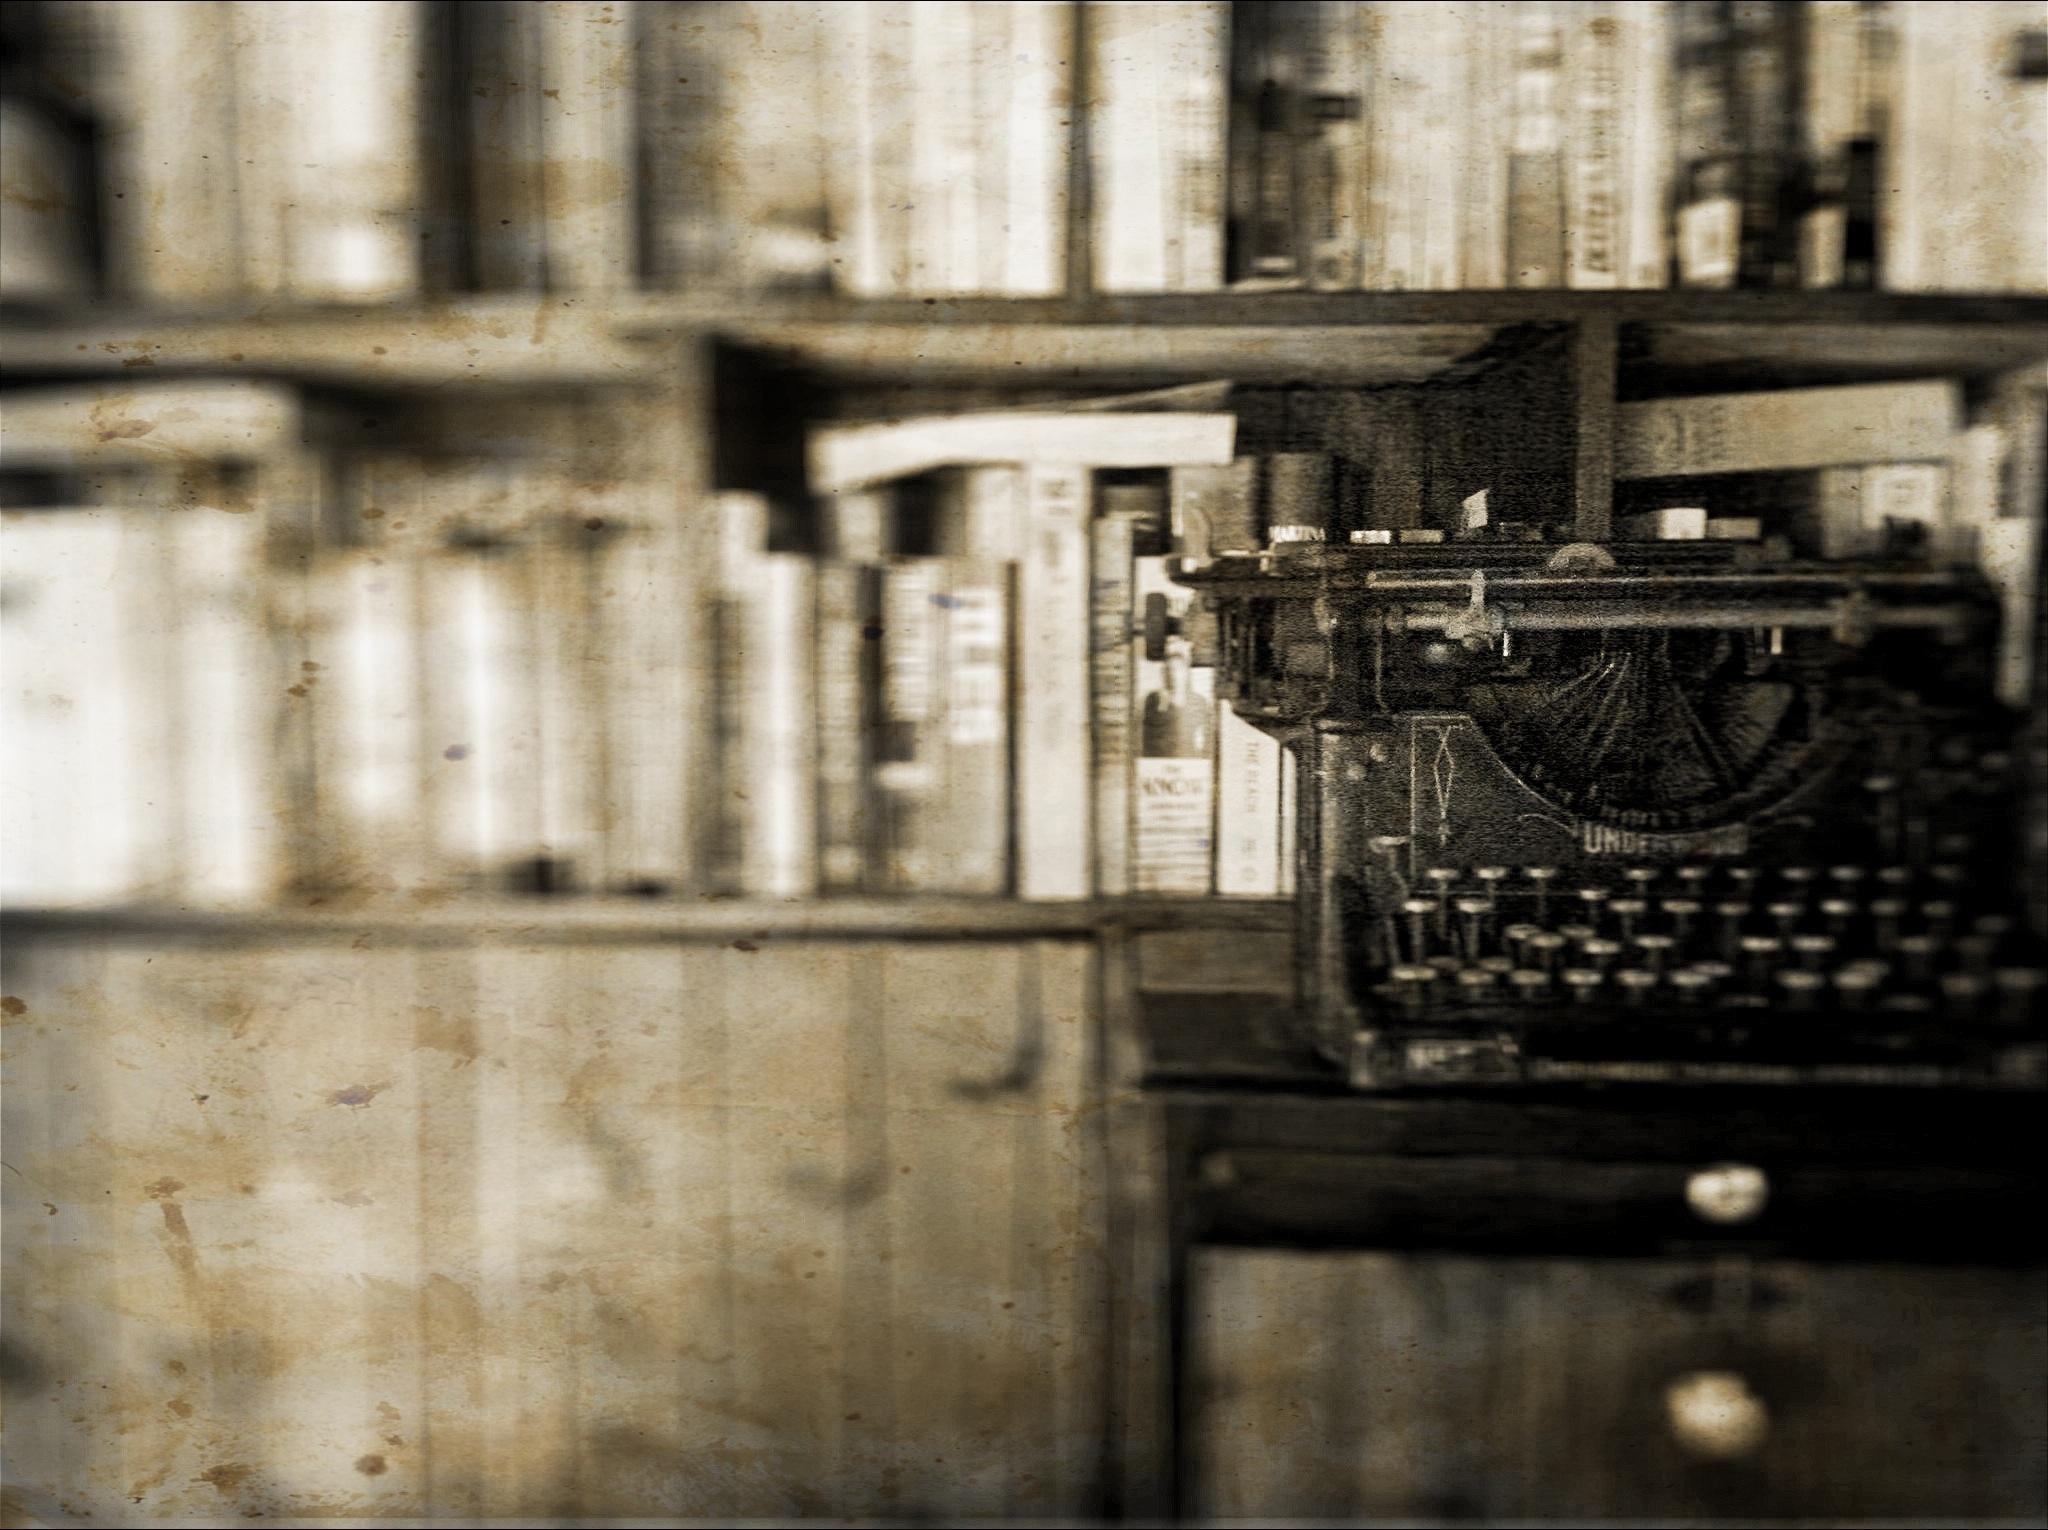 Mystery writers by Nana B Agyei. Licence CC. https://www.flickr.com/photos/nanagyei/5199156473/